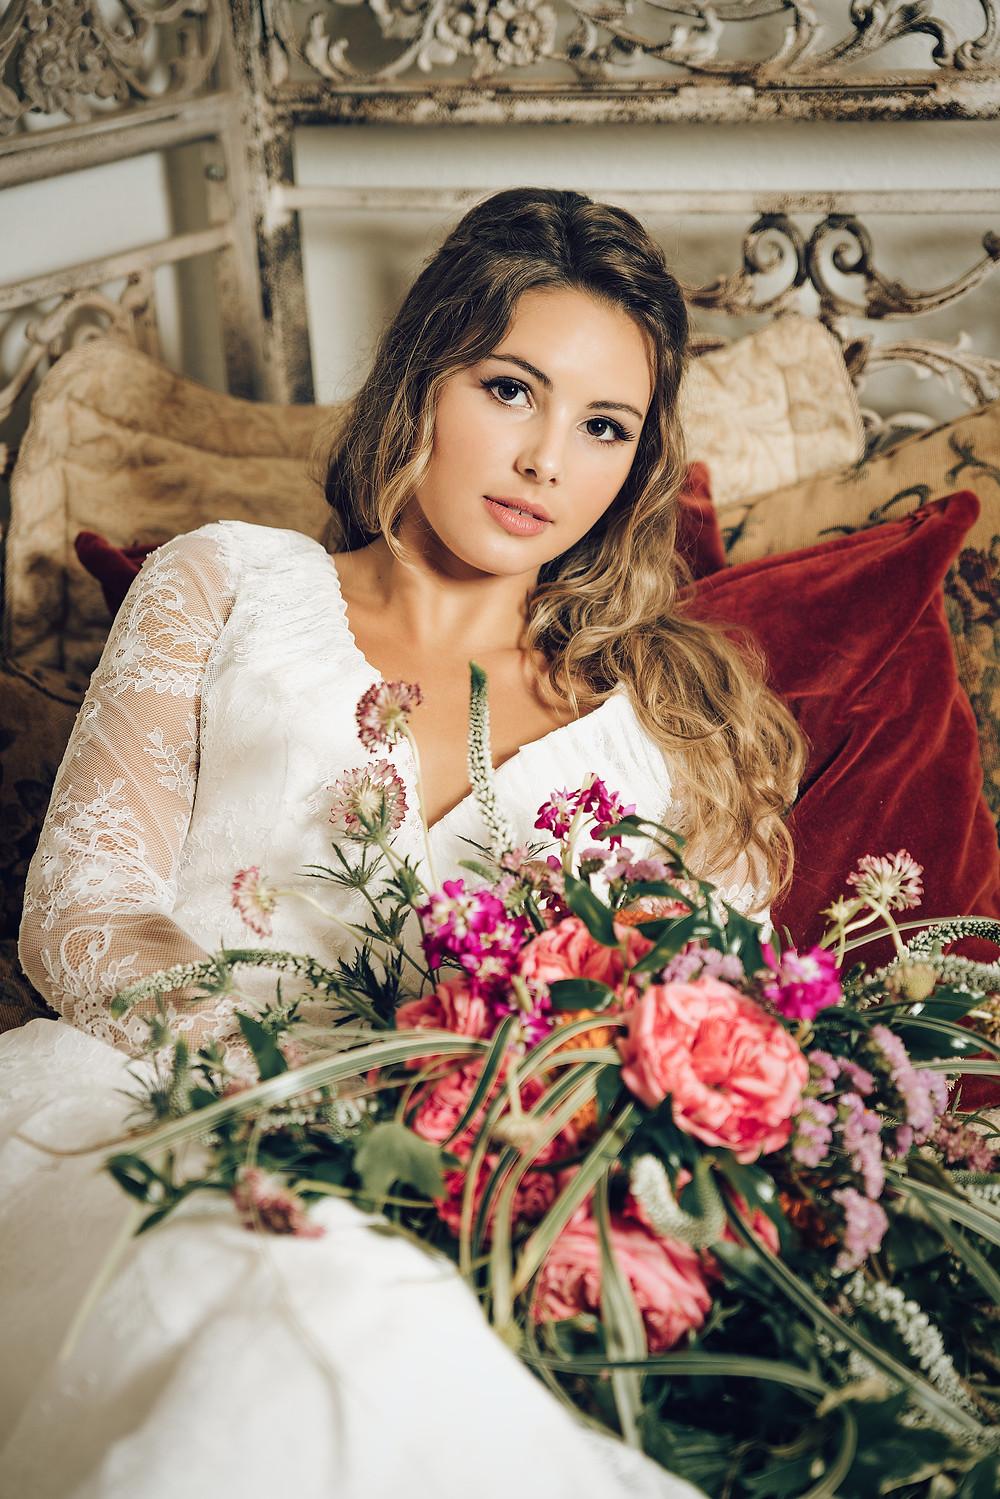 staged photo shoot, elopement venue, wedding florals